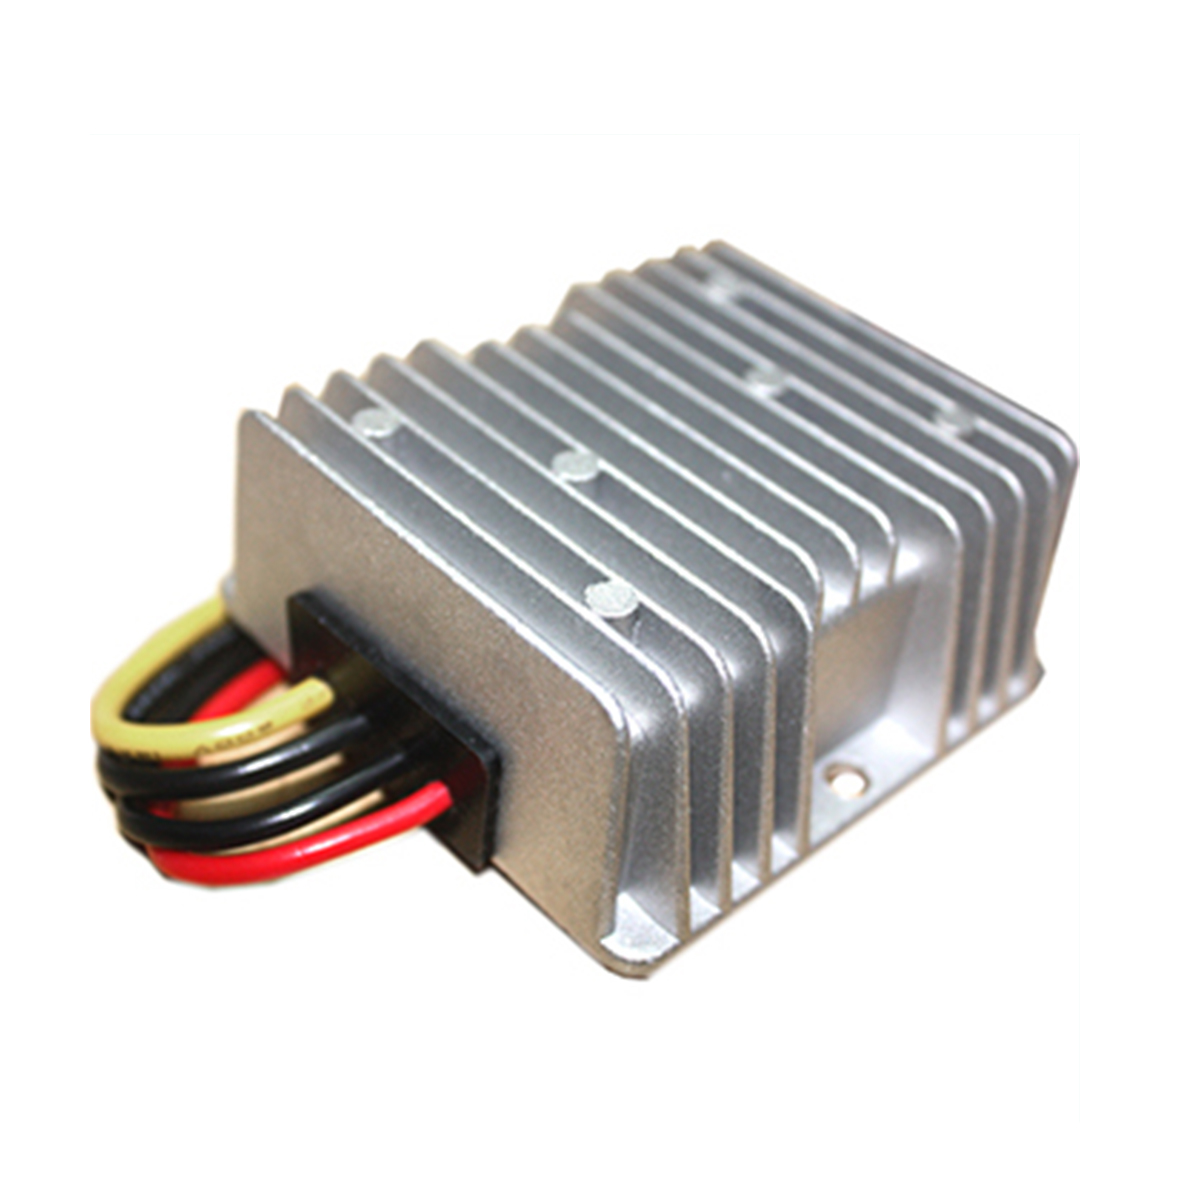 [ATI]DCU82.S156012-005AWP DC 전압 변환기(Step down converter)15~60VDC/ 12dc/방수형60W/5A